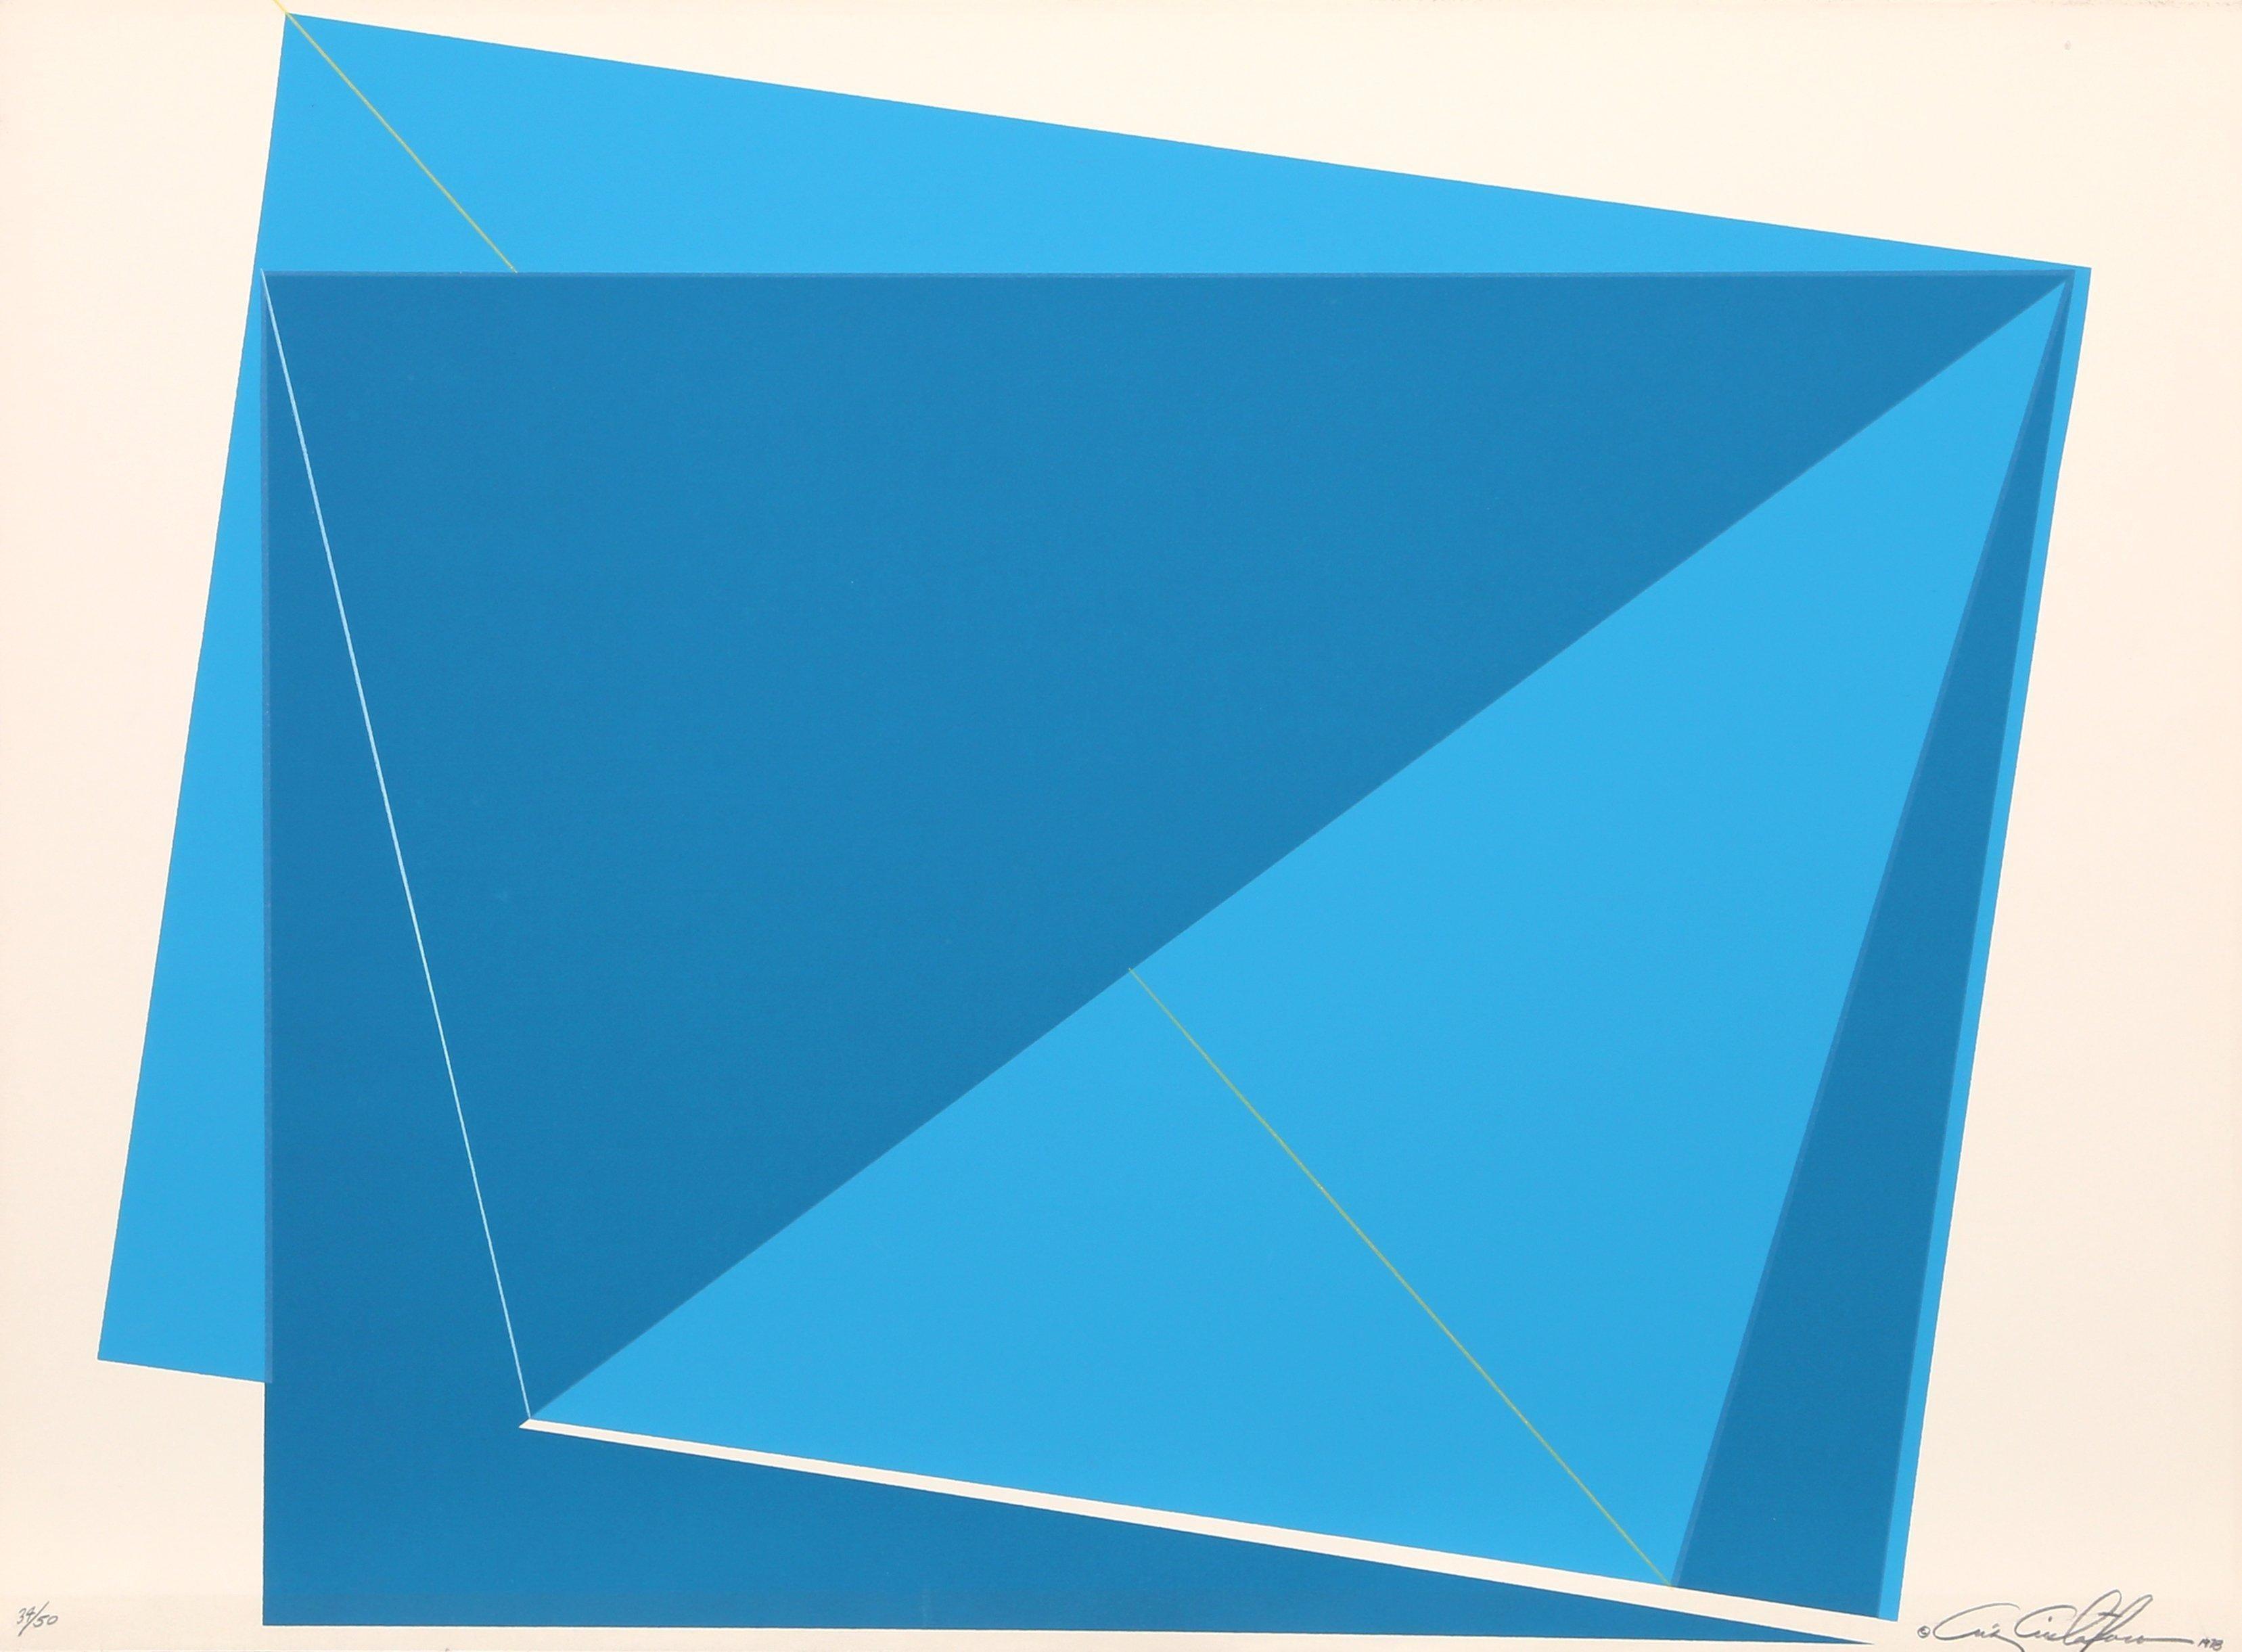 Blue Rectangles, Geometric Abstract Silkscreen by Cristofaro